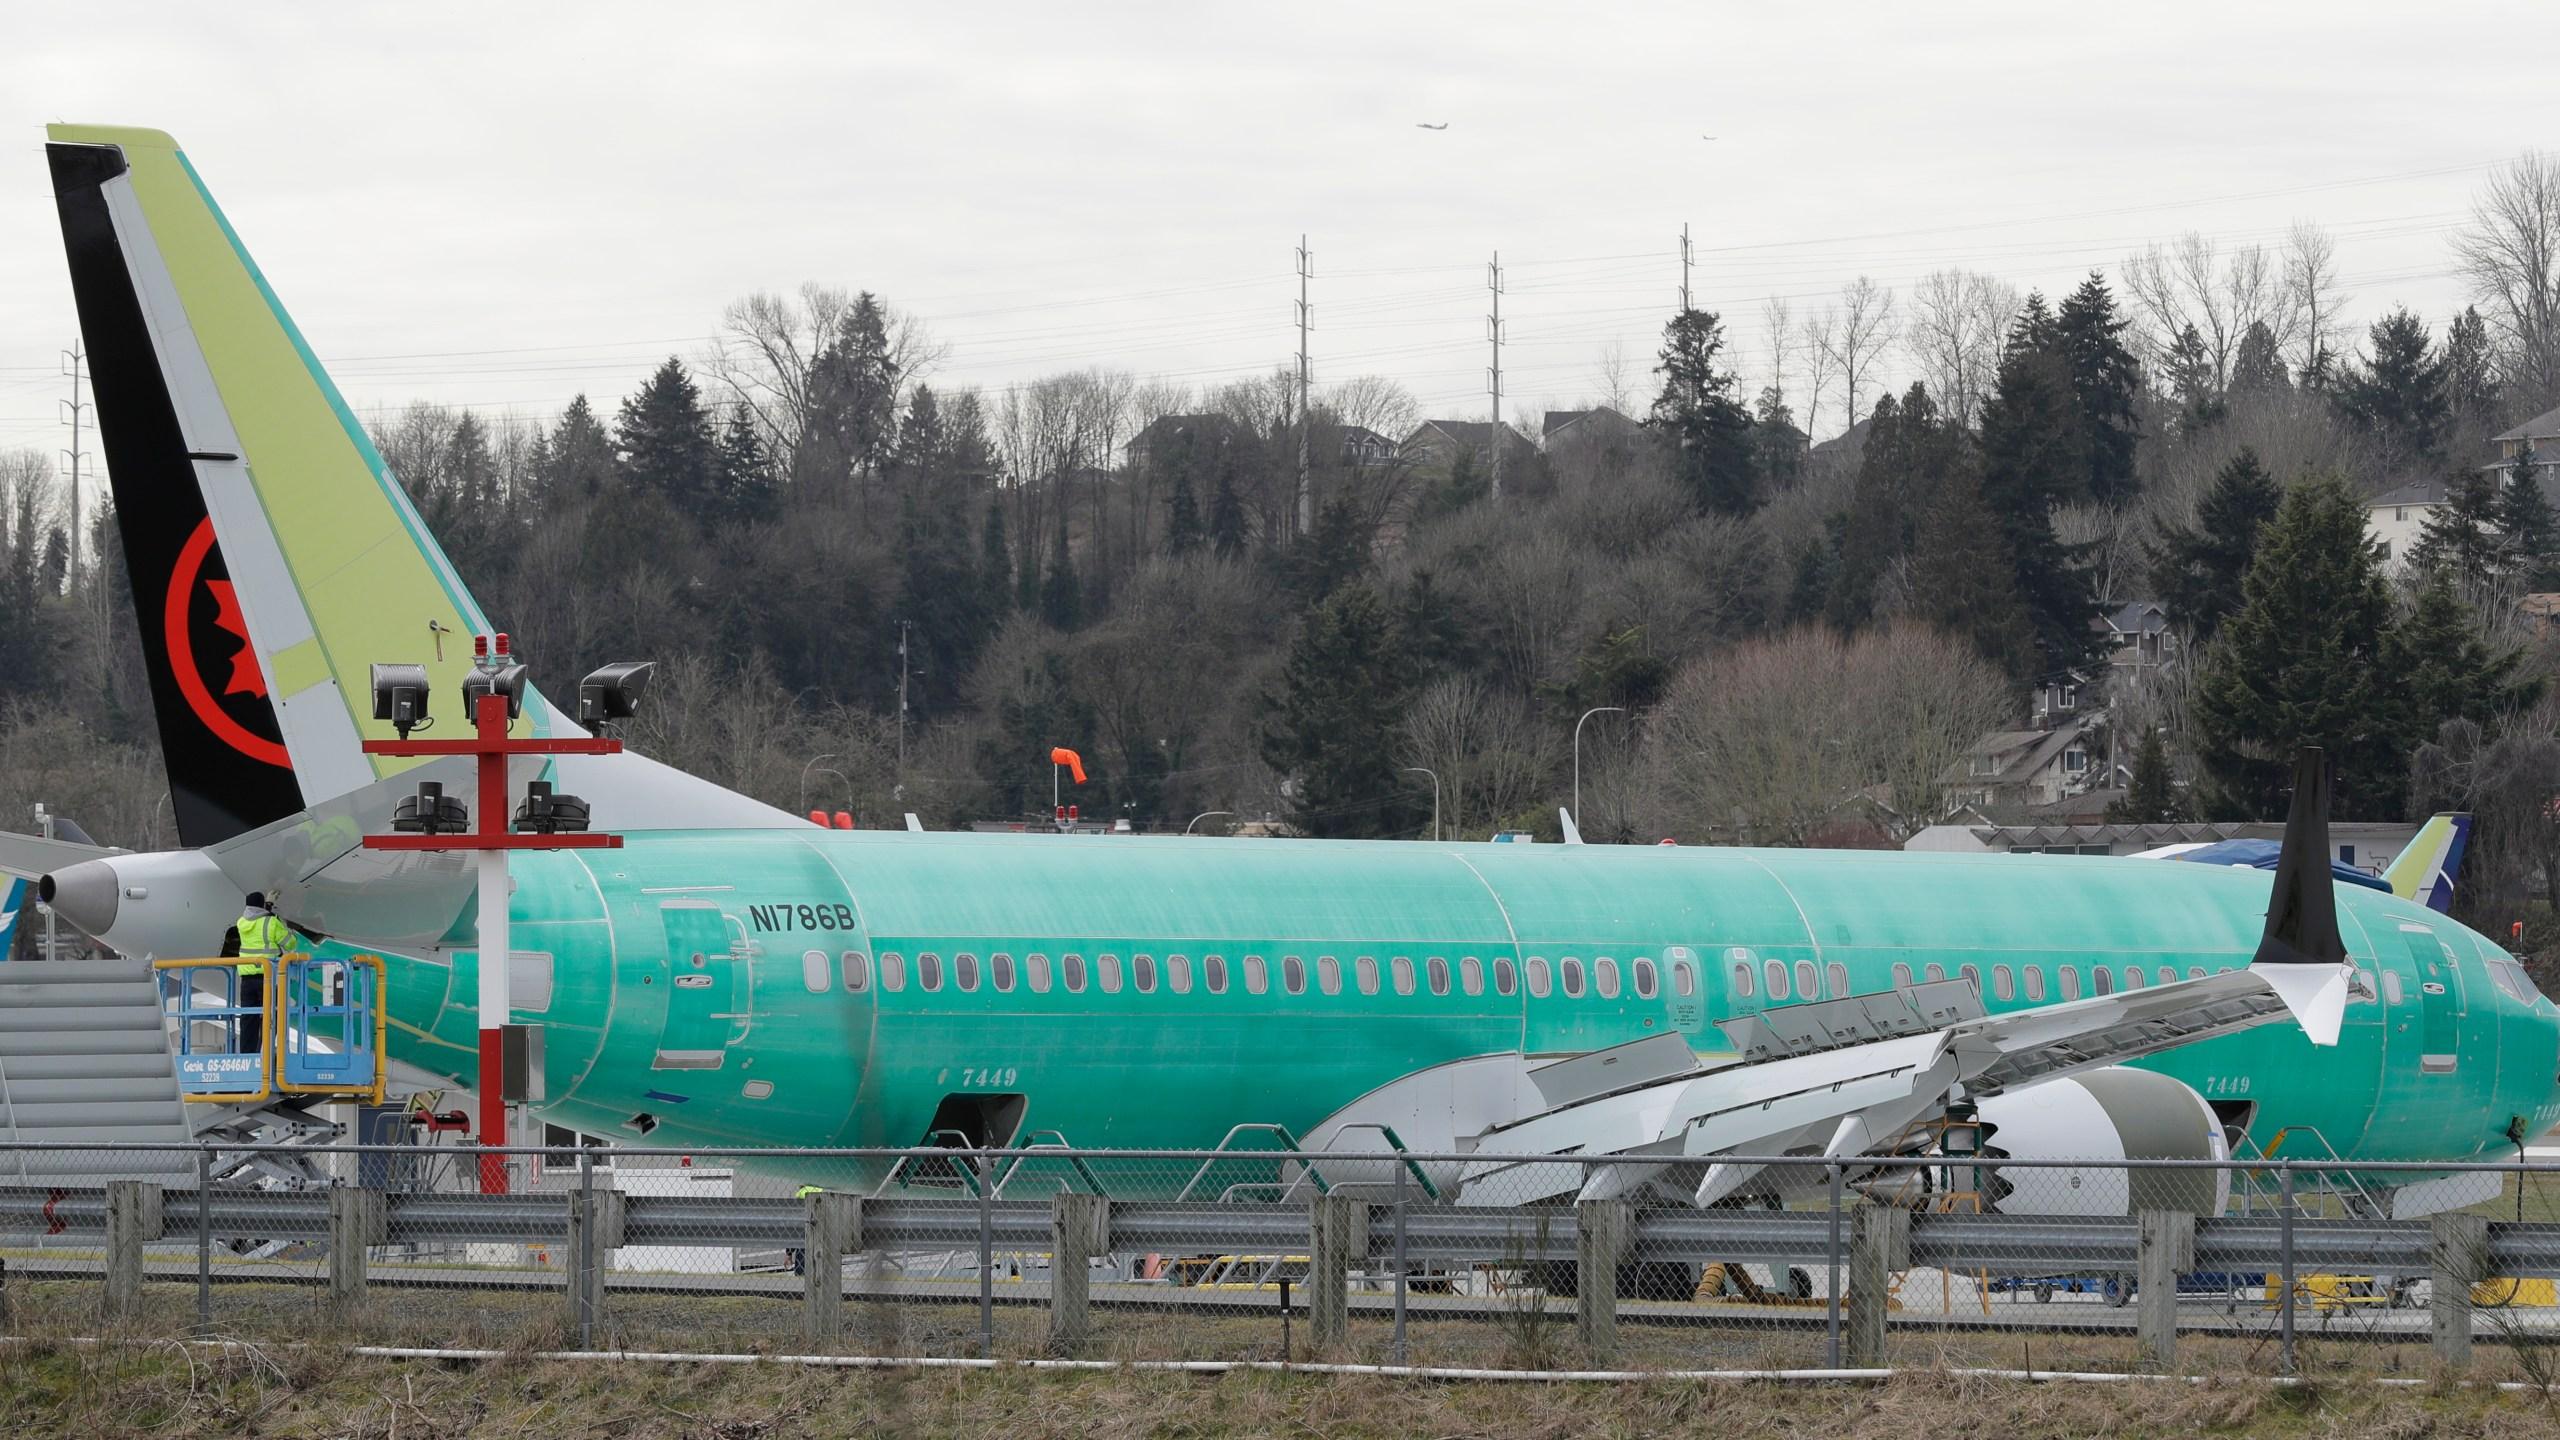 Ethiopia_Plane_Crash_Boeing_87029-159532.jpg68577988